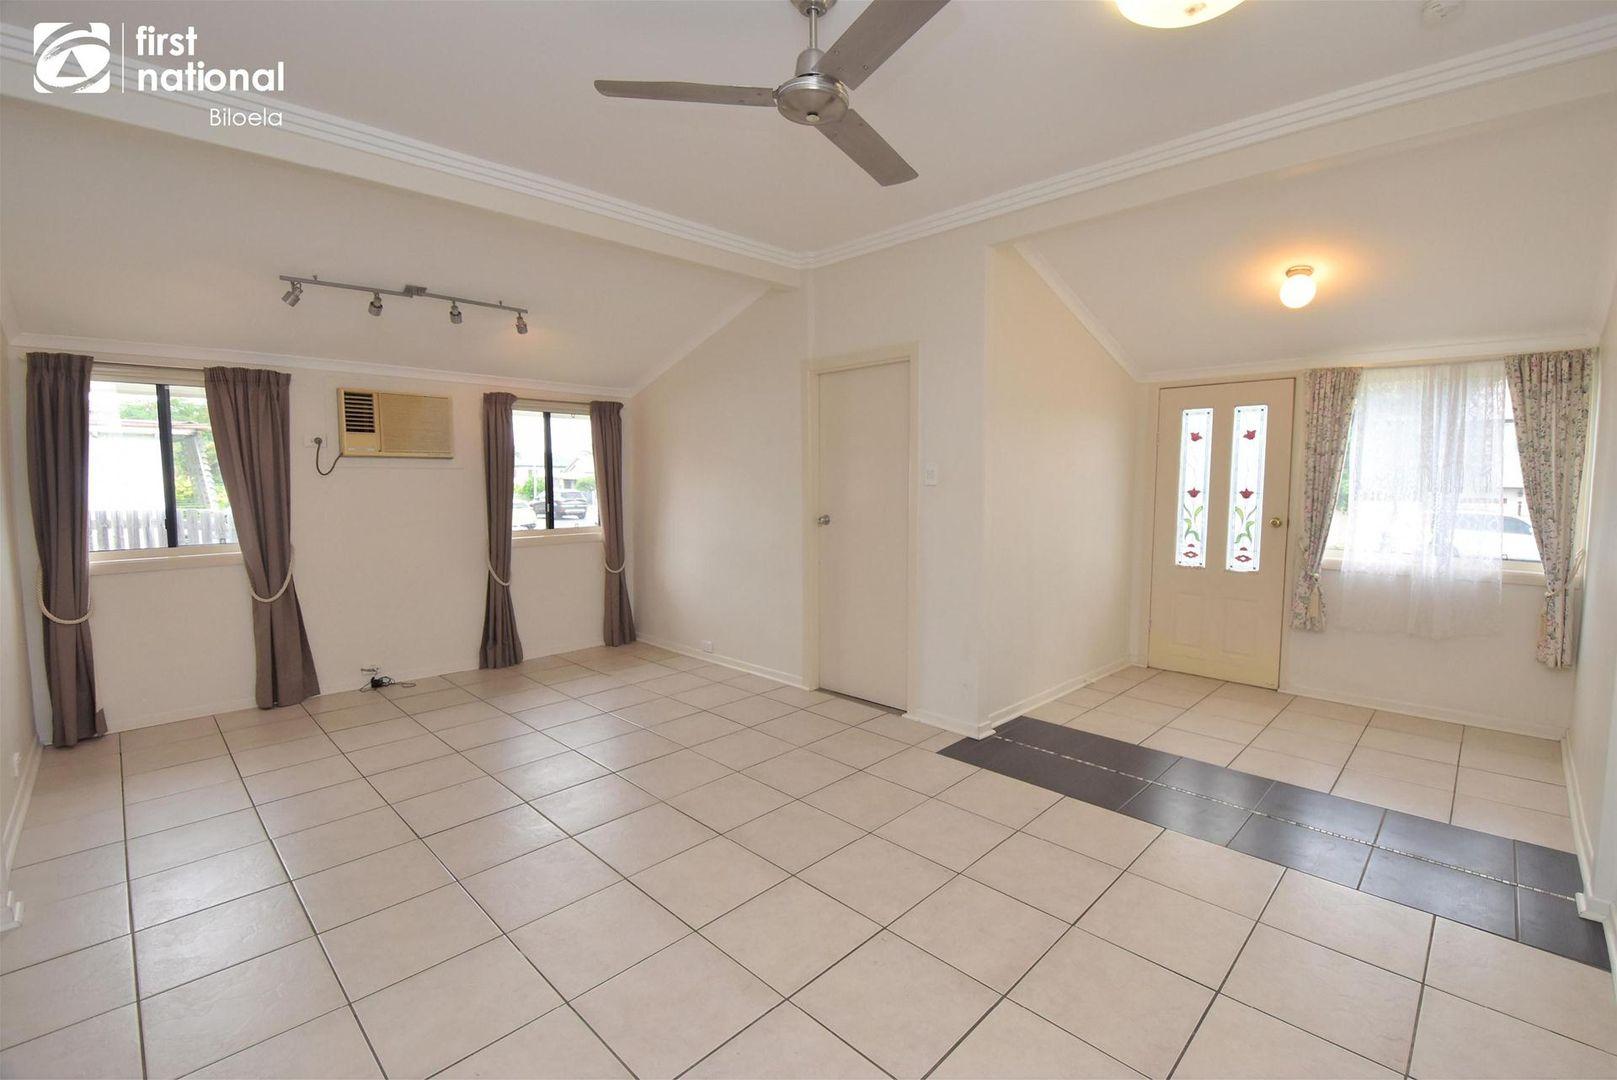 38 Grevillea Street, Biloela QLD 4715, Image 1